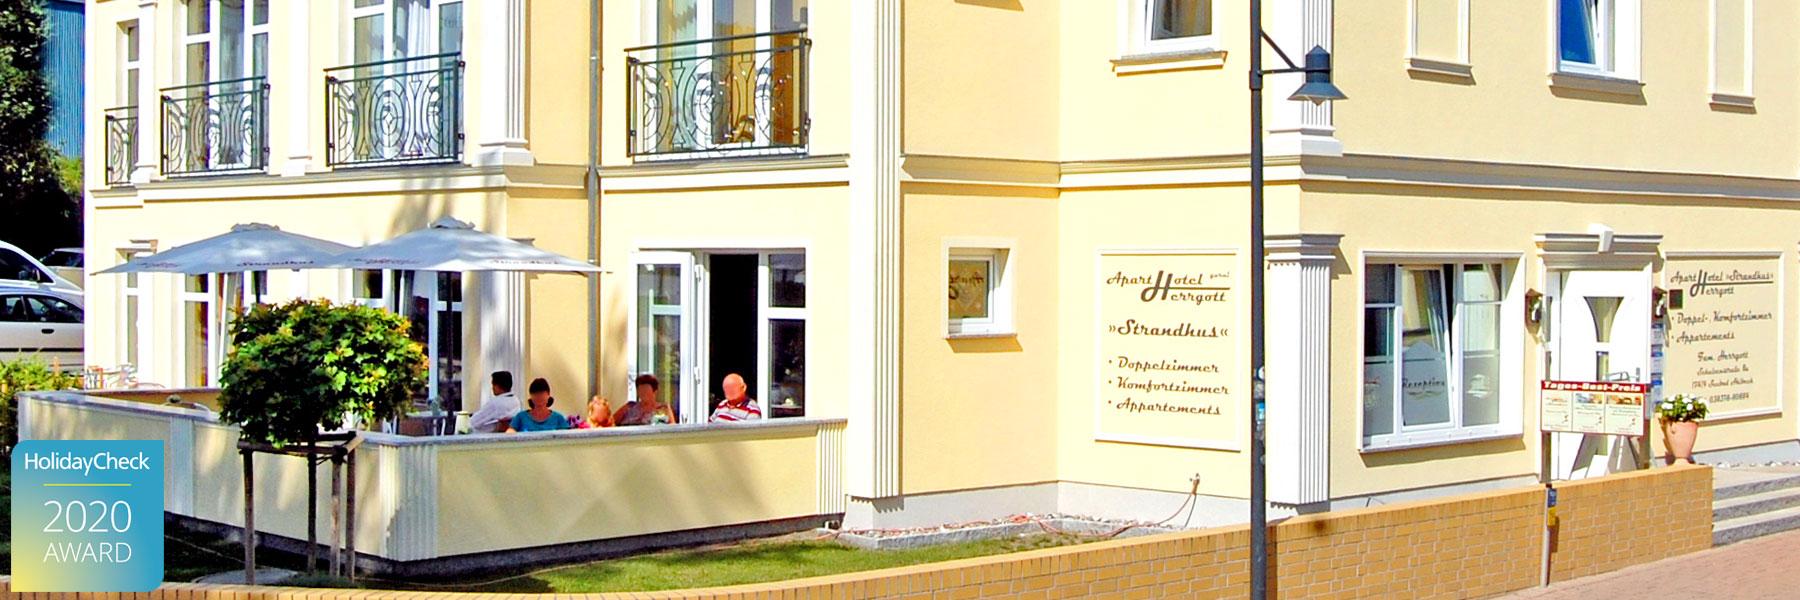 "Terrasse - Aparthotel ""Strandhus"" Familie Herrgott"